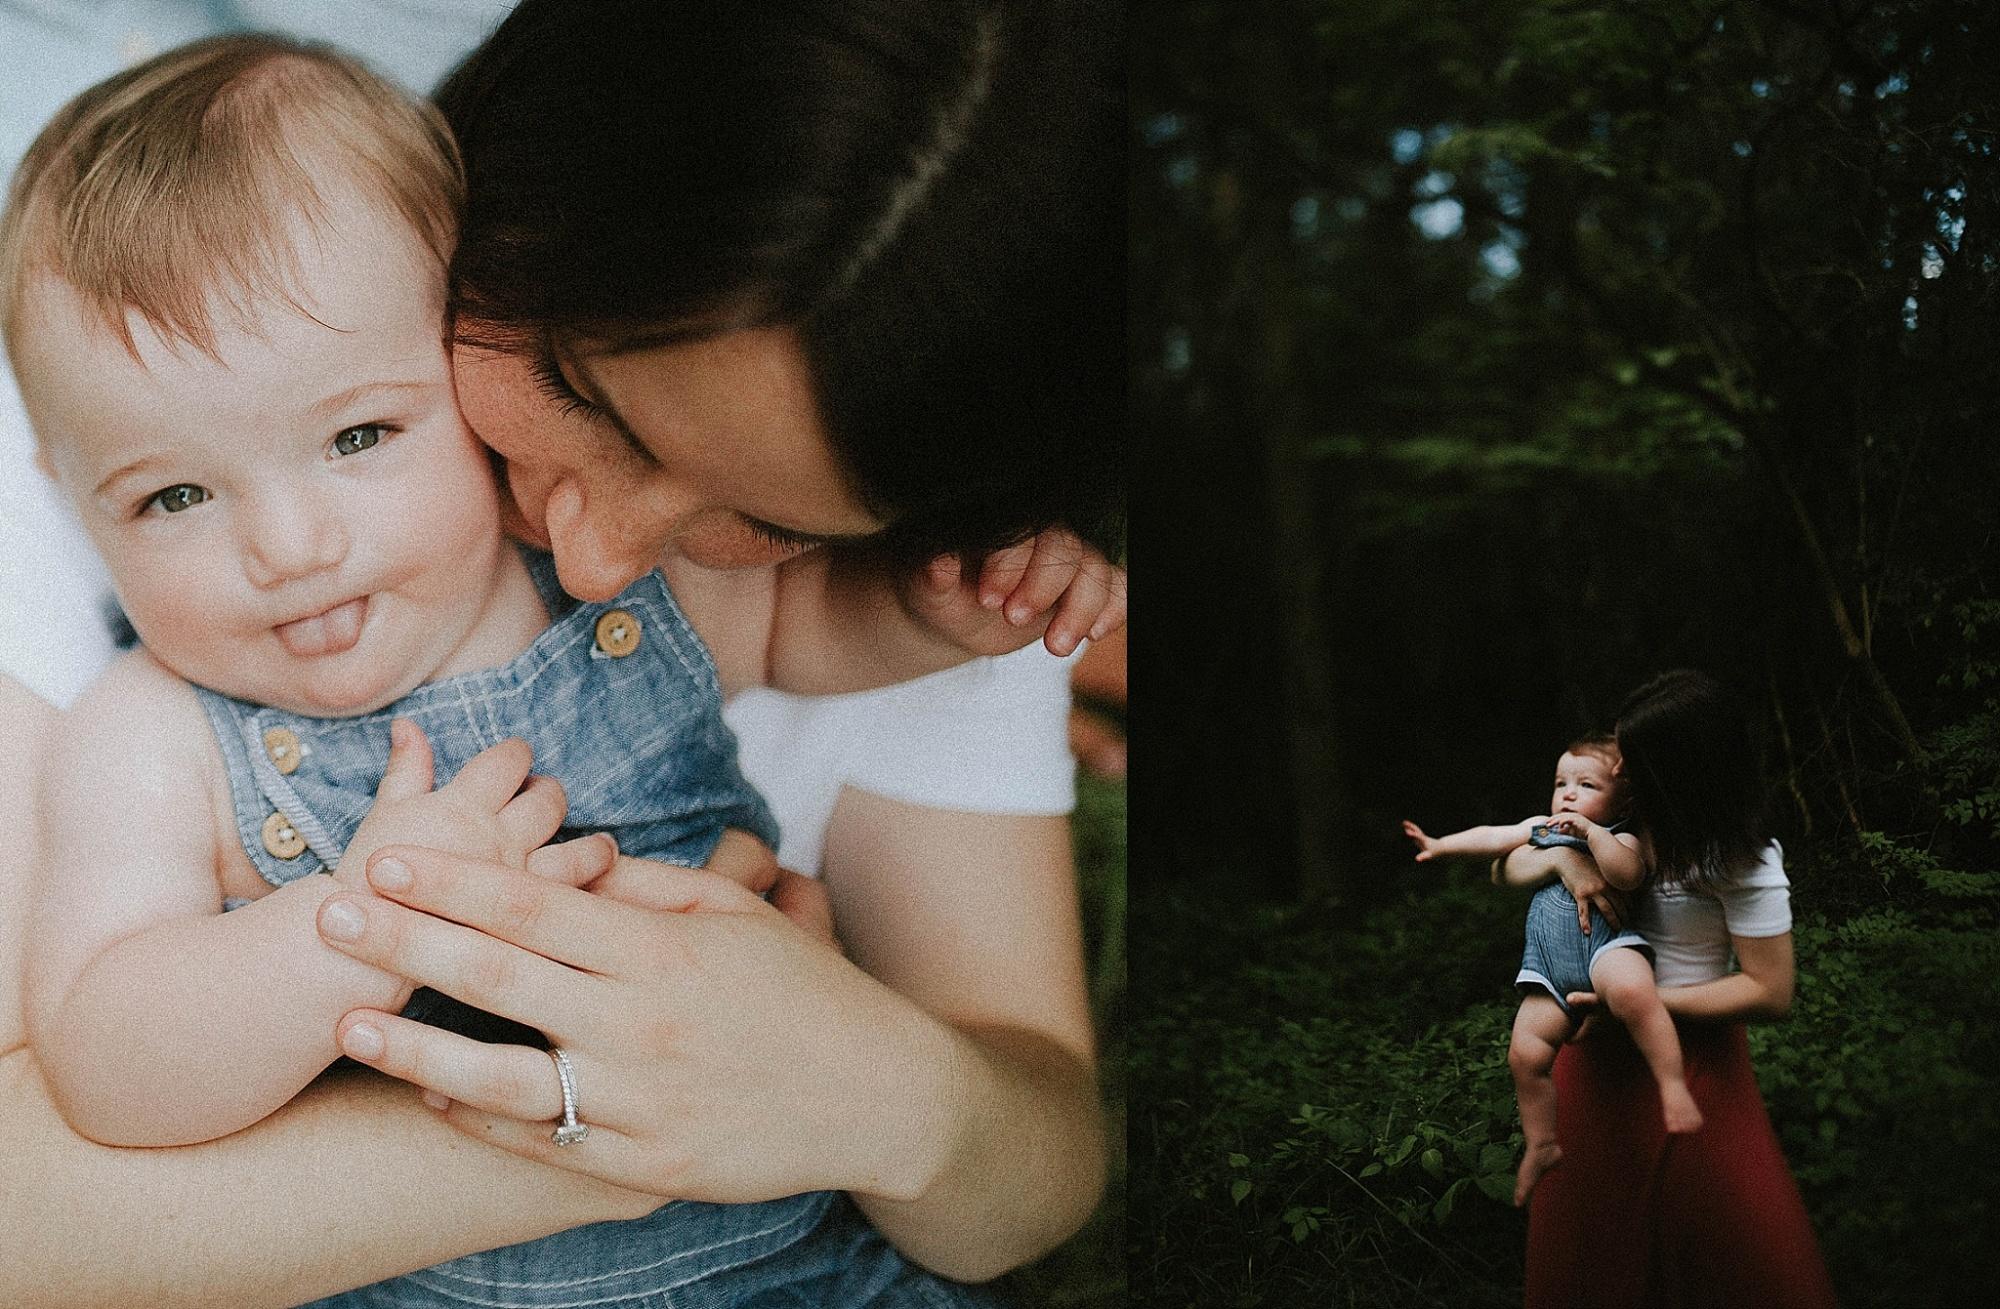 ADRI DE LA CRUZ CHICAGO AND WEST SUBURBS FAMILY PHOTOGRAPHER (6)